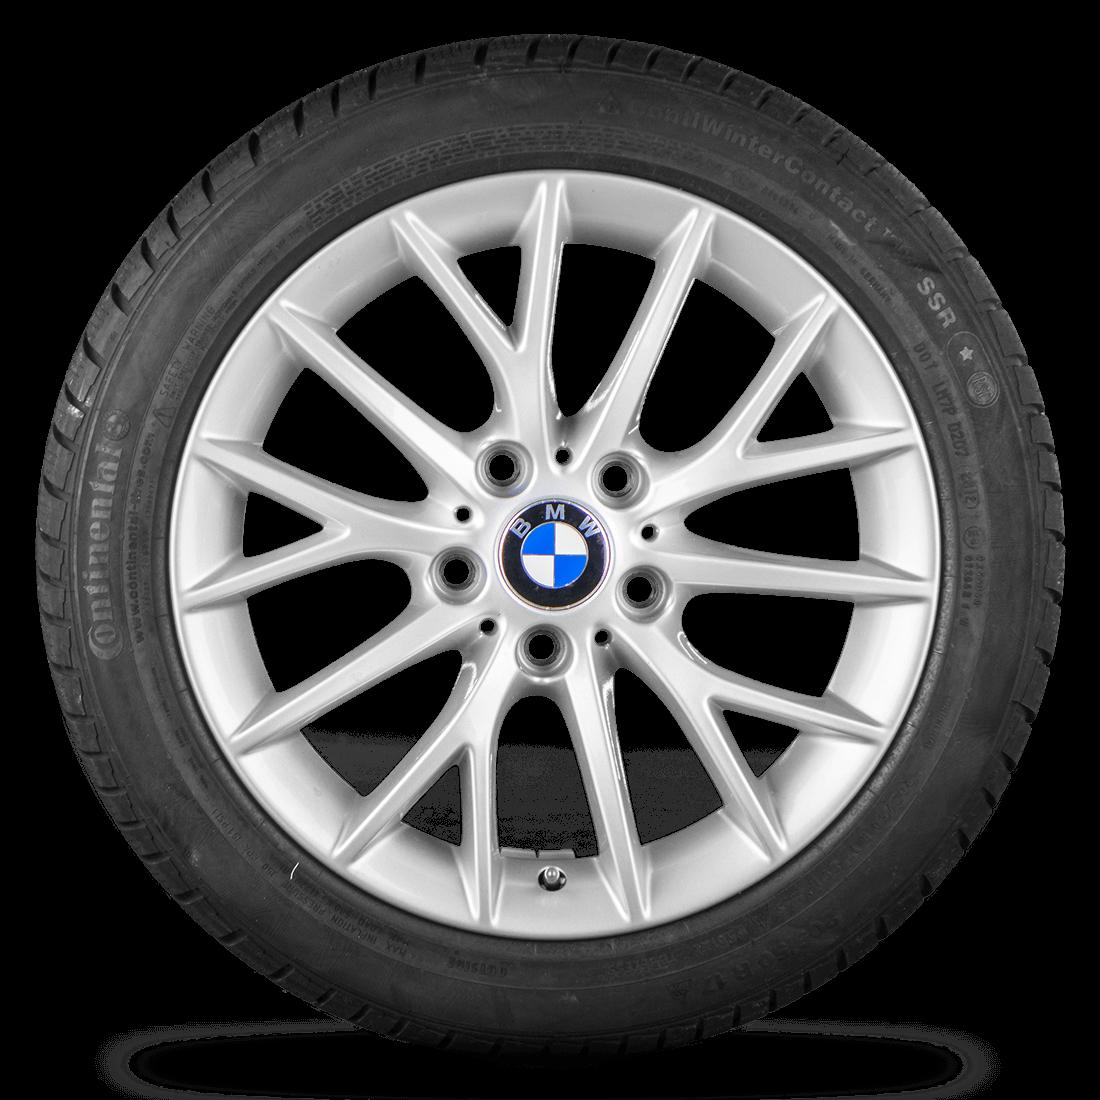 BMW 1er F20 F21 2er F22 F23 17 Zoll Winterreifen Alufelgen Felgen Styling 380